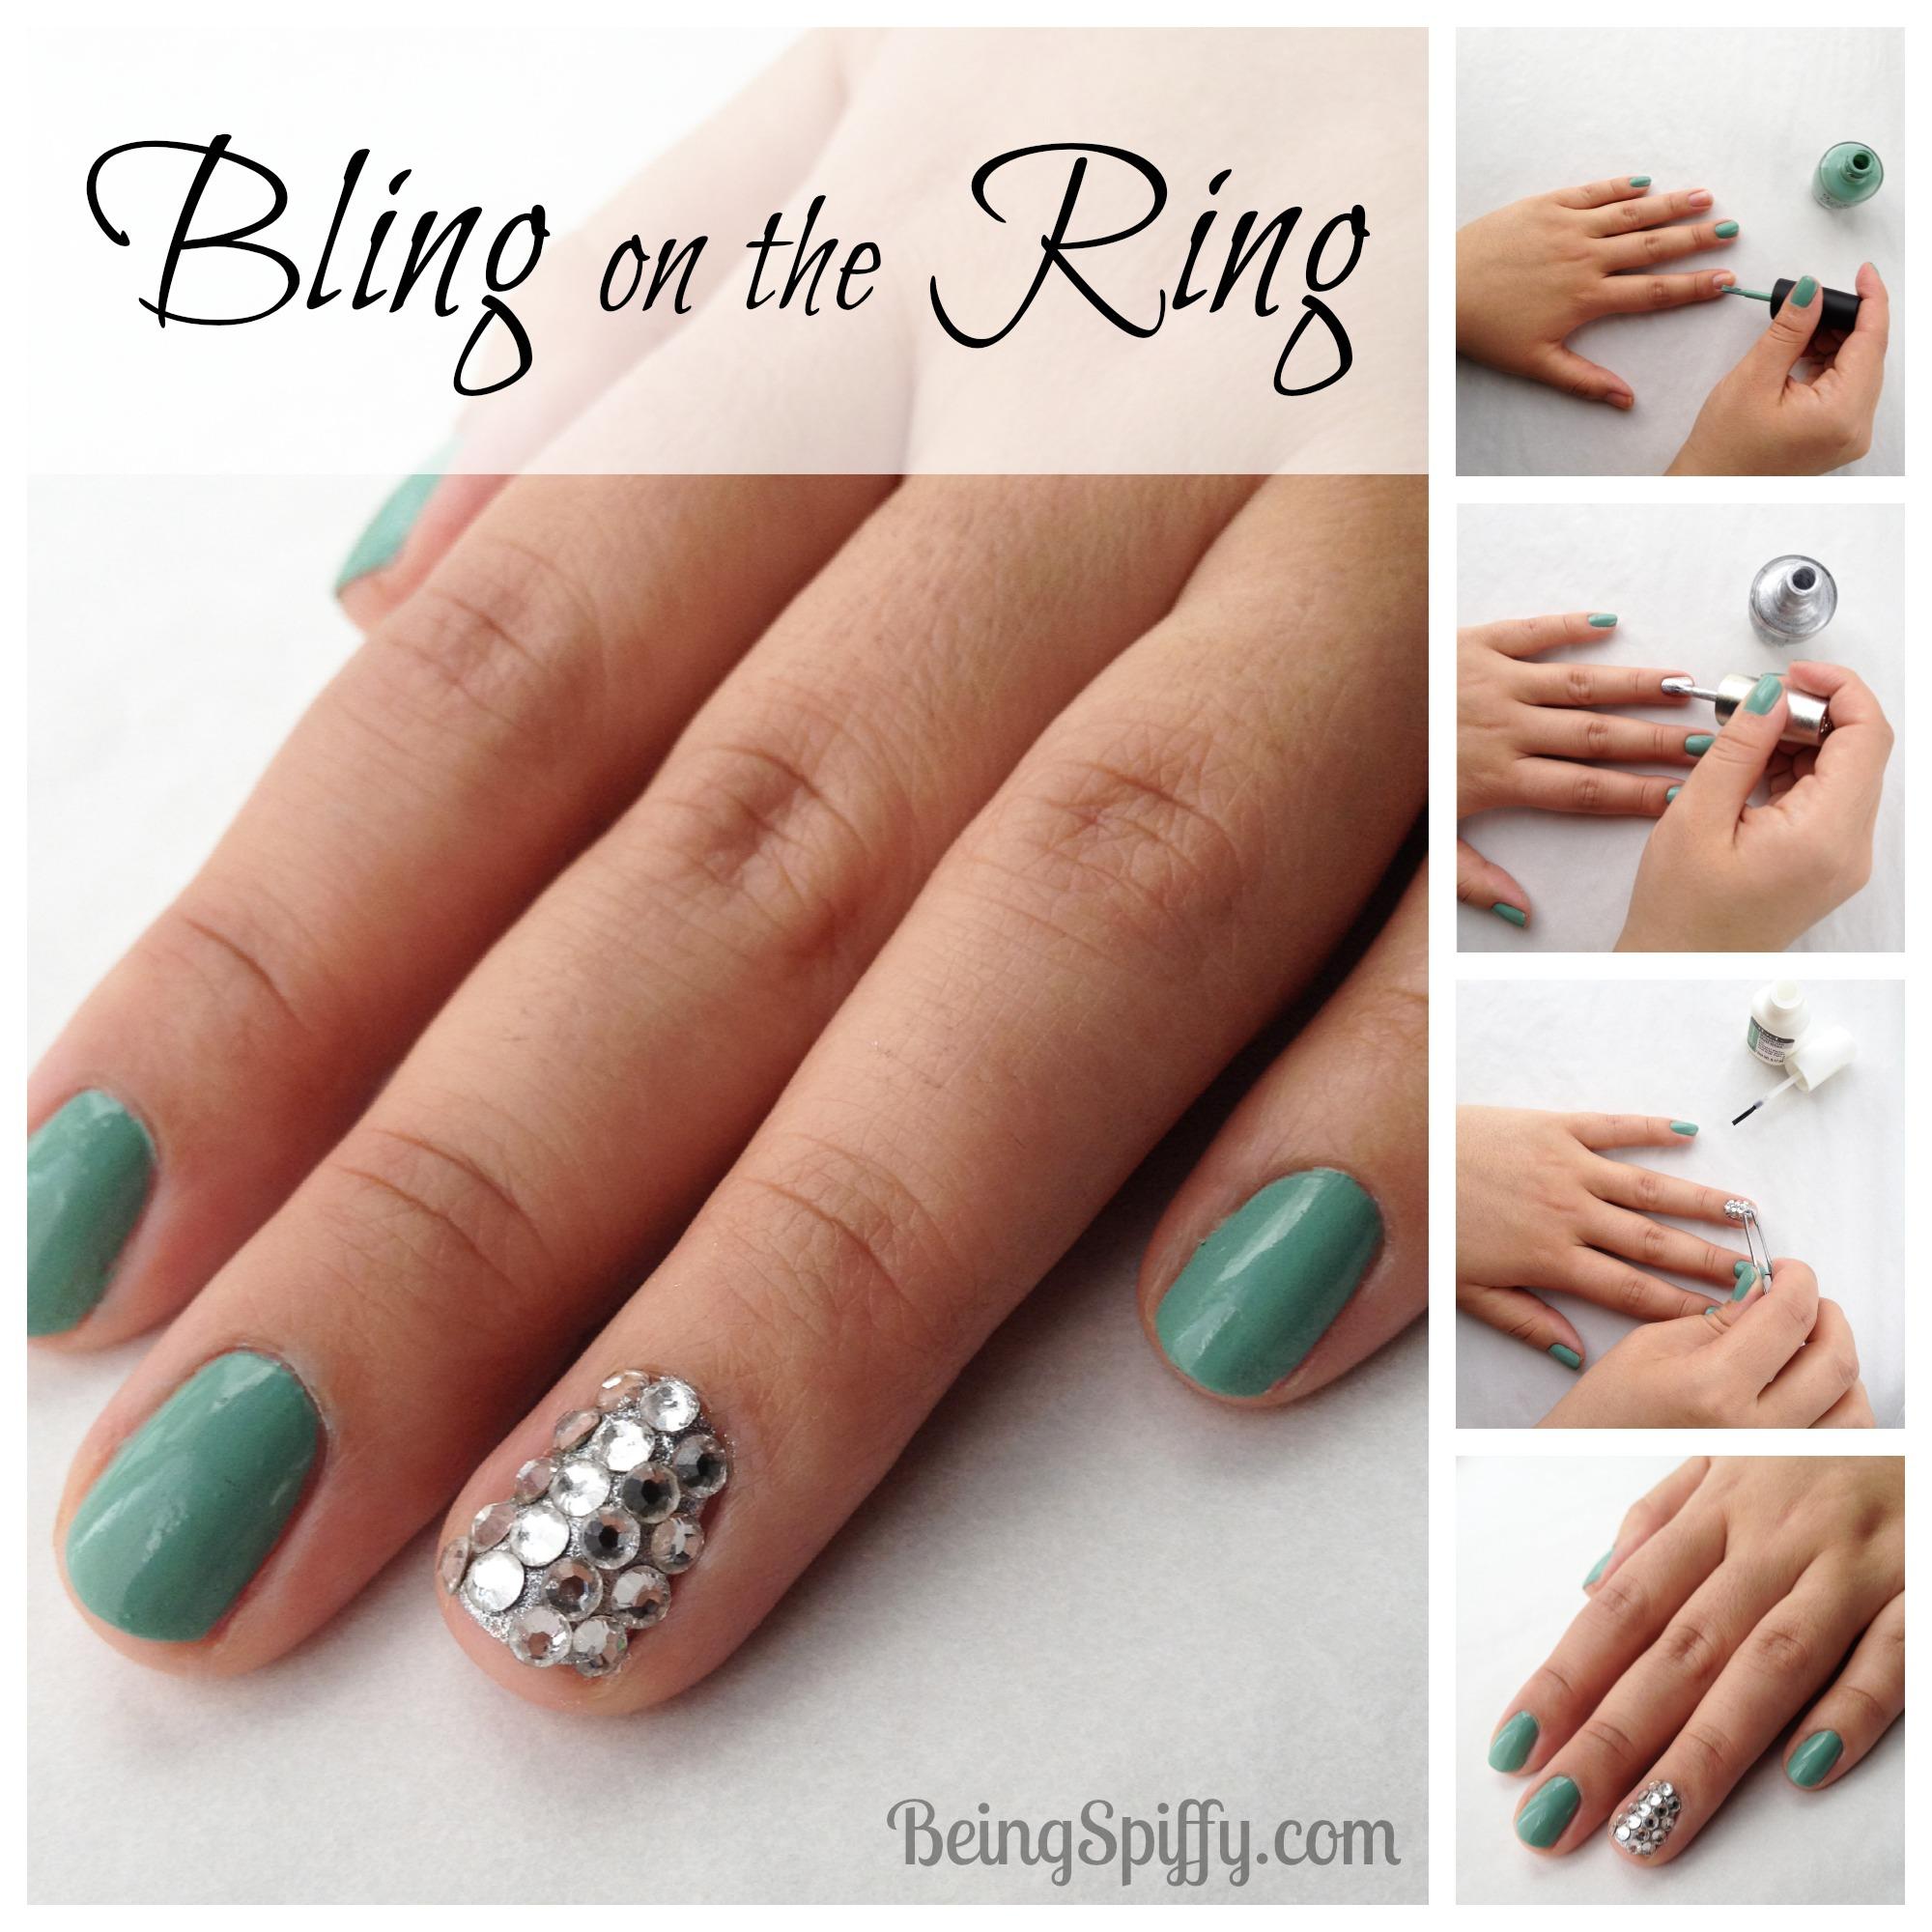 bling_nail_title.jpg